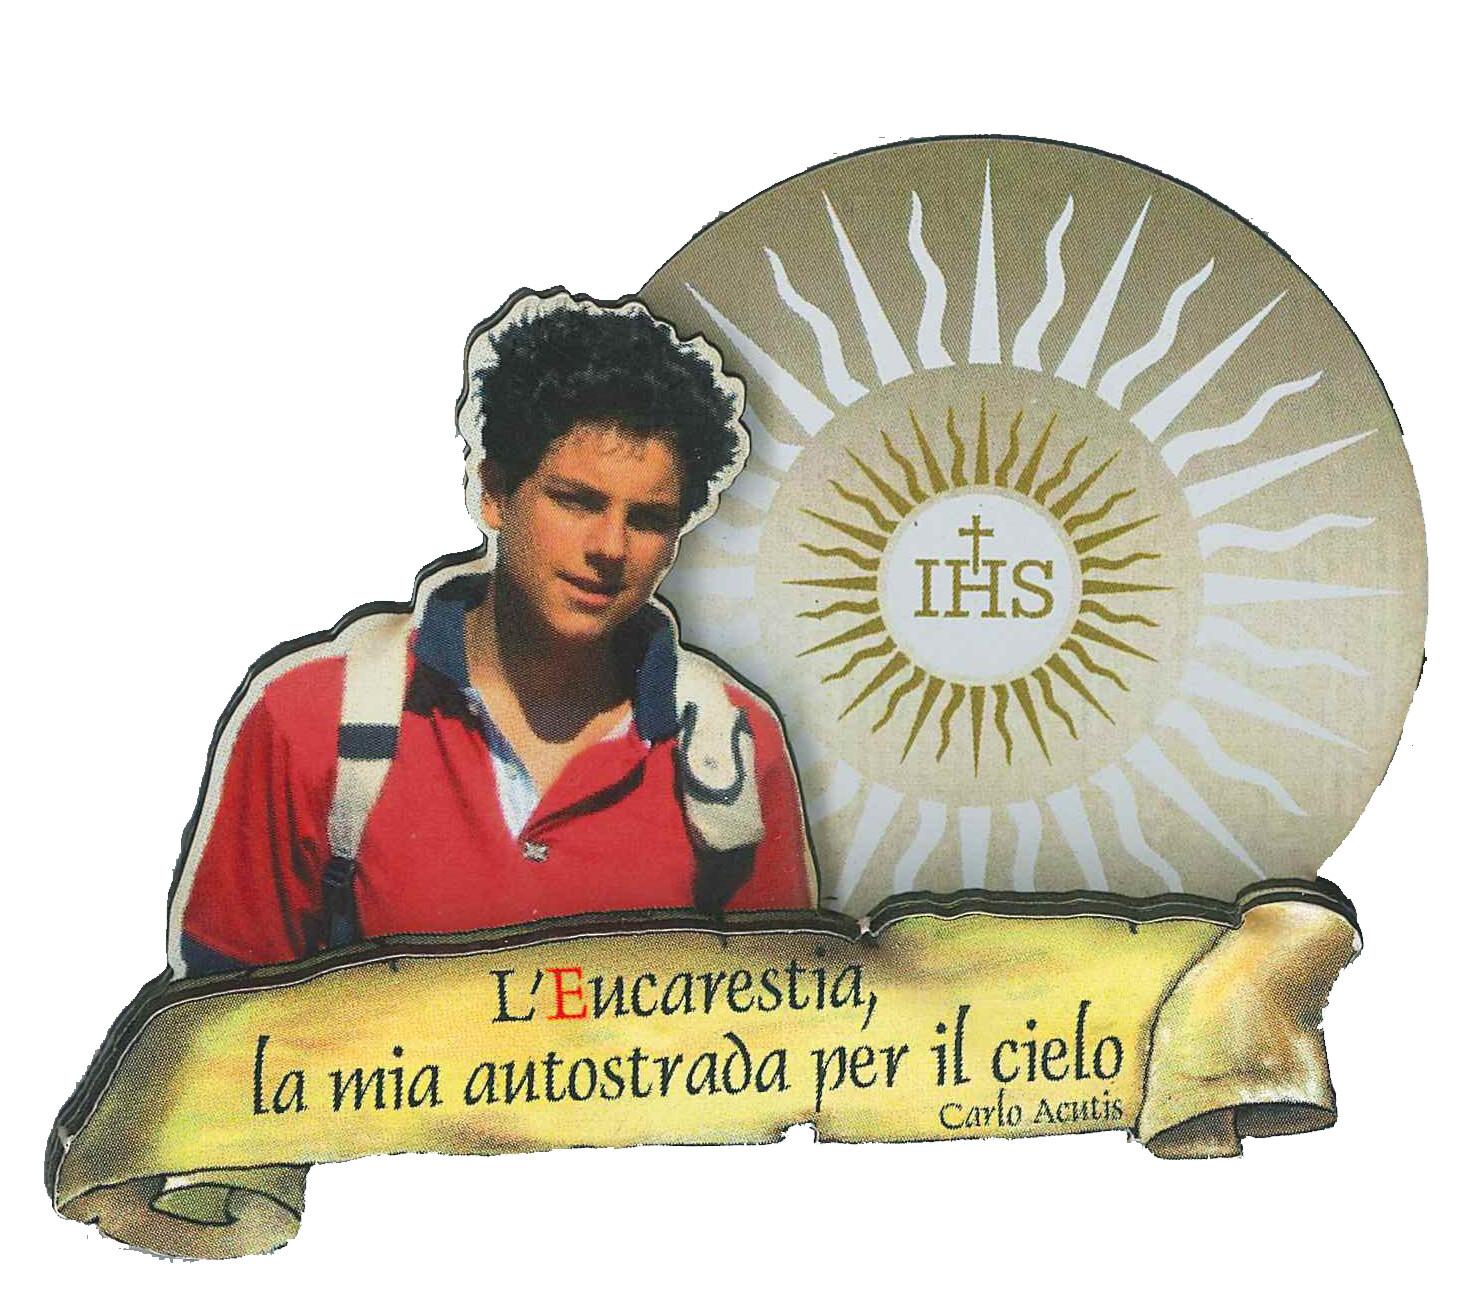 Calamita Carlo Acutis 3D